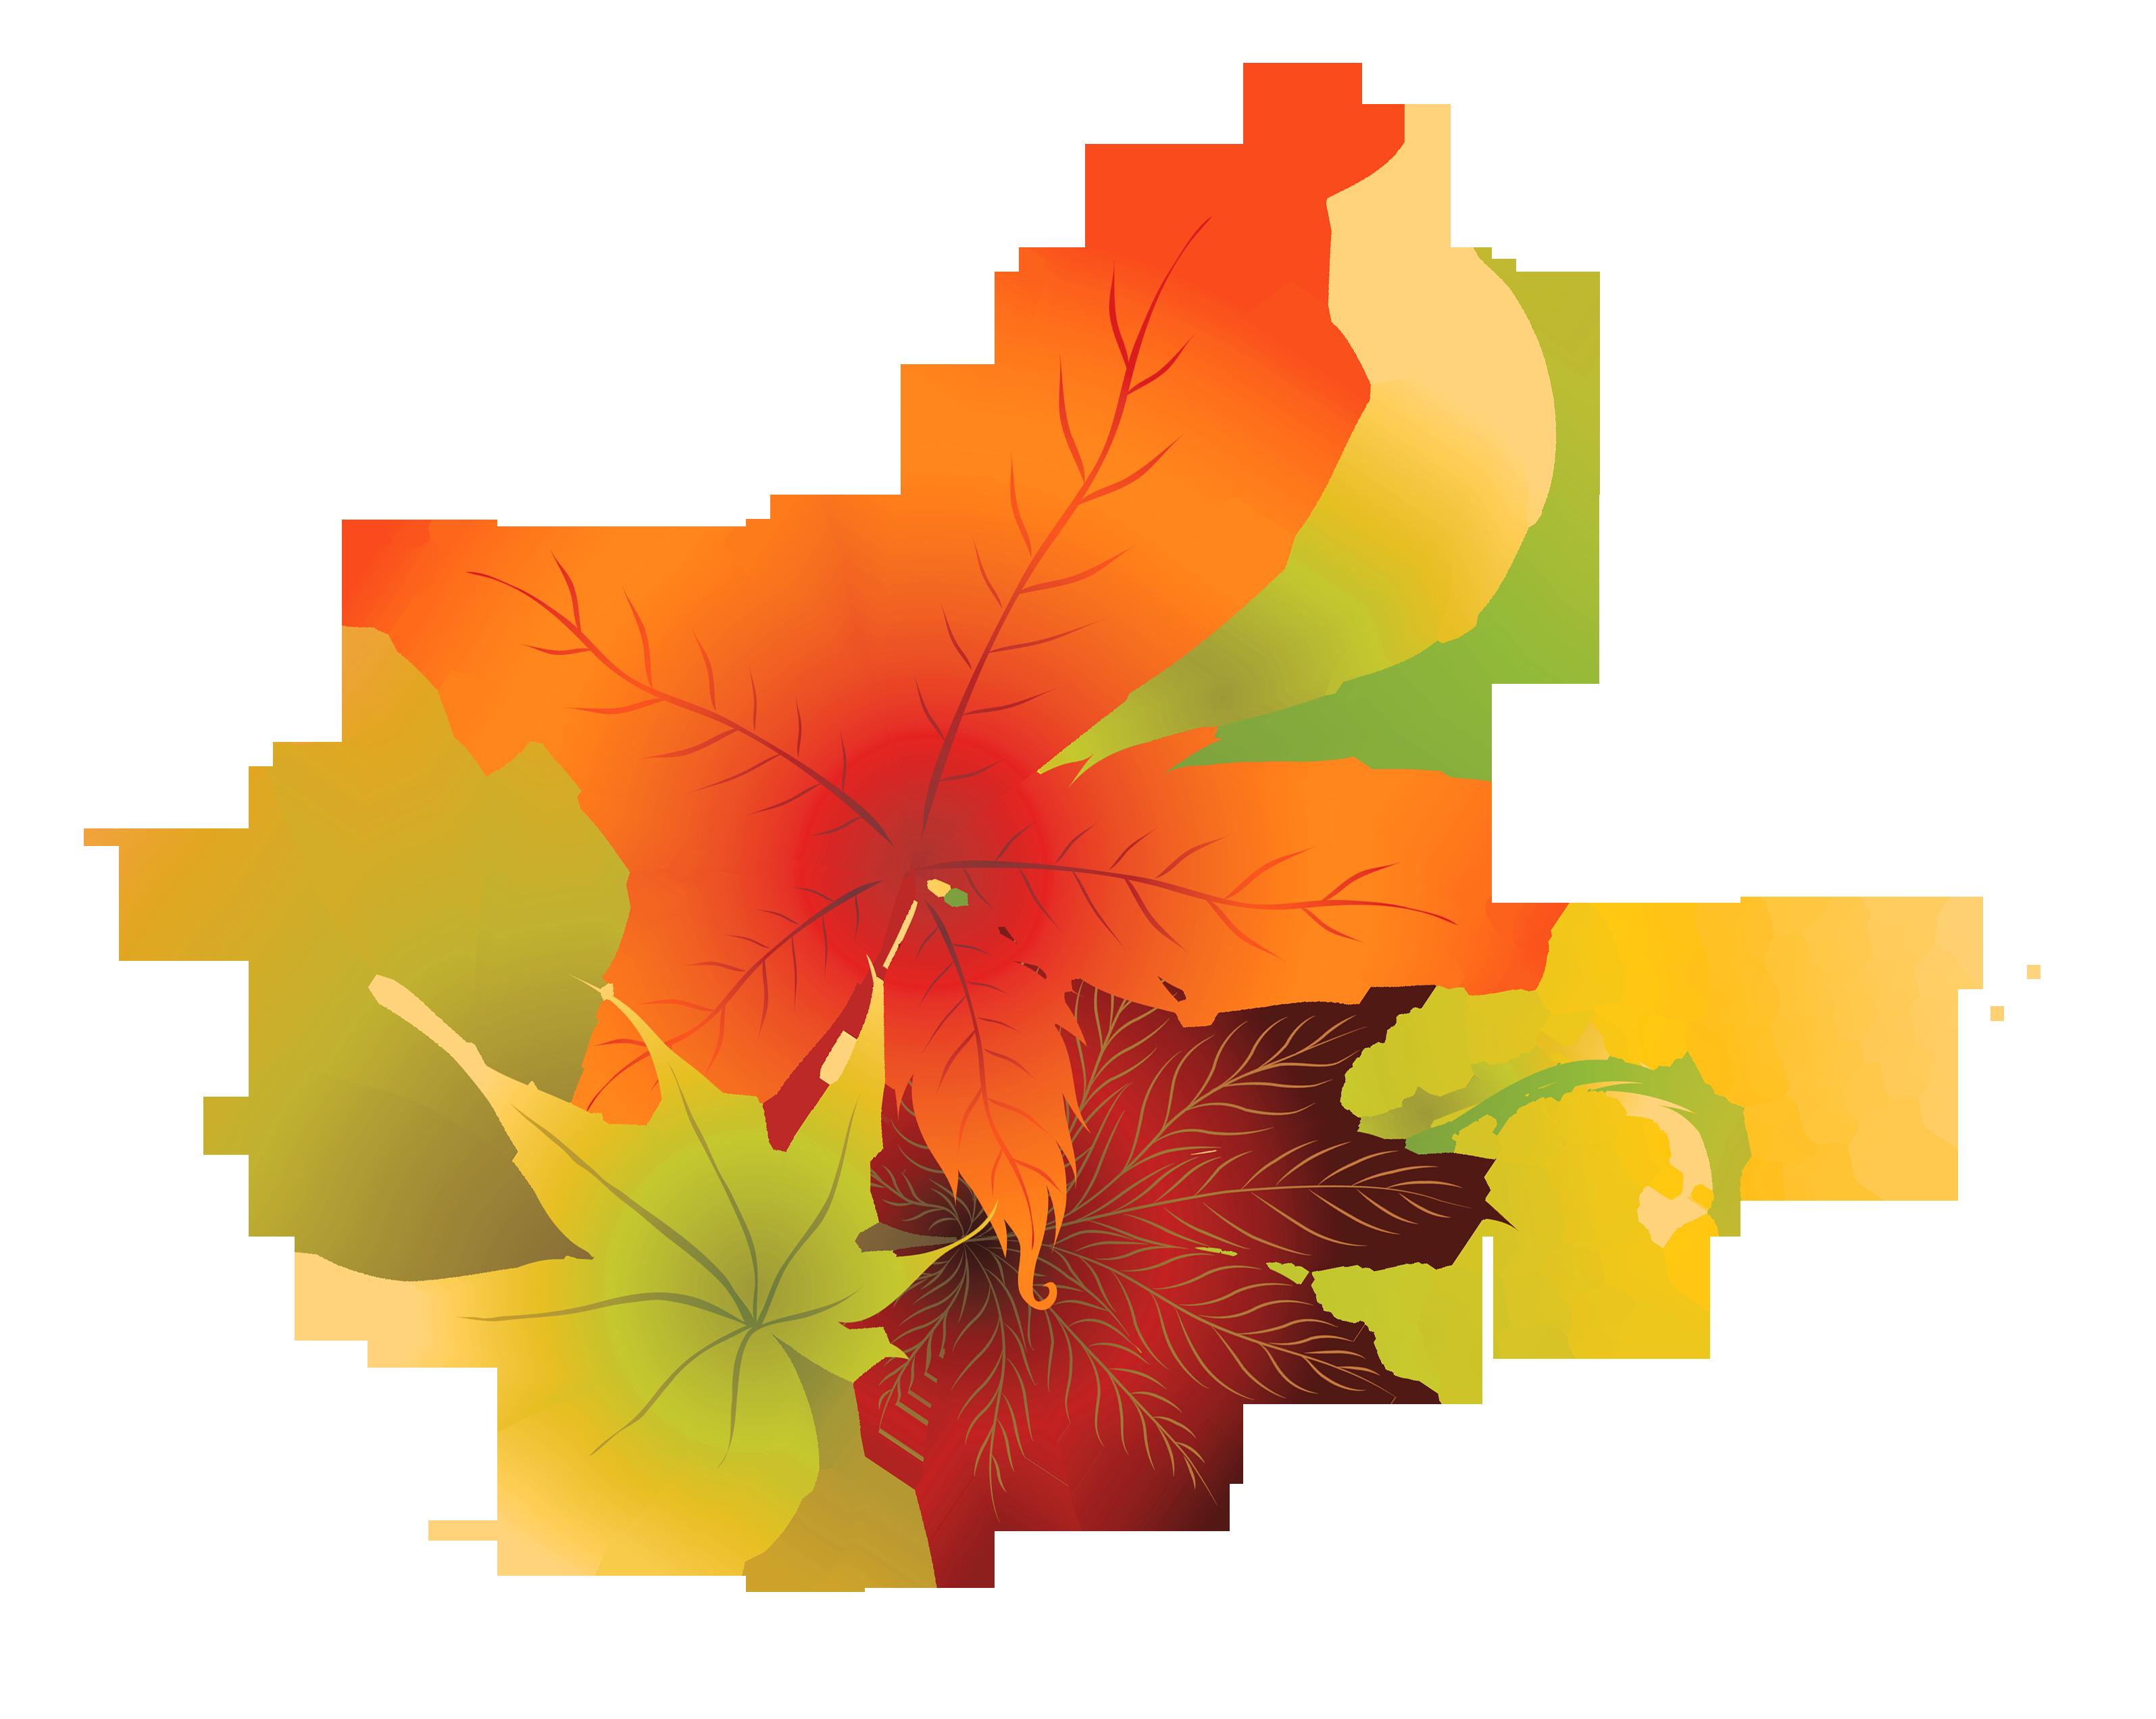 Fall Leaves 7 Free Autumn And Fall Clip -Fall leaves 7 free autumn and fall clip art collections 2 clipartcow-9